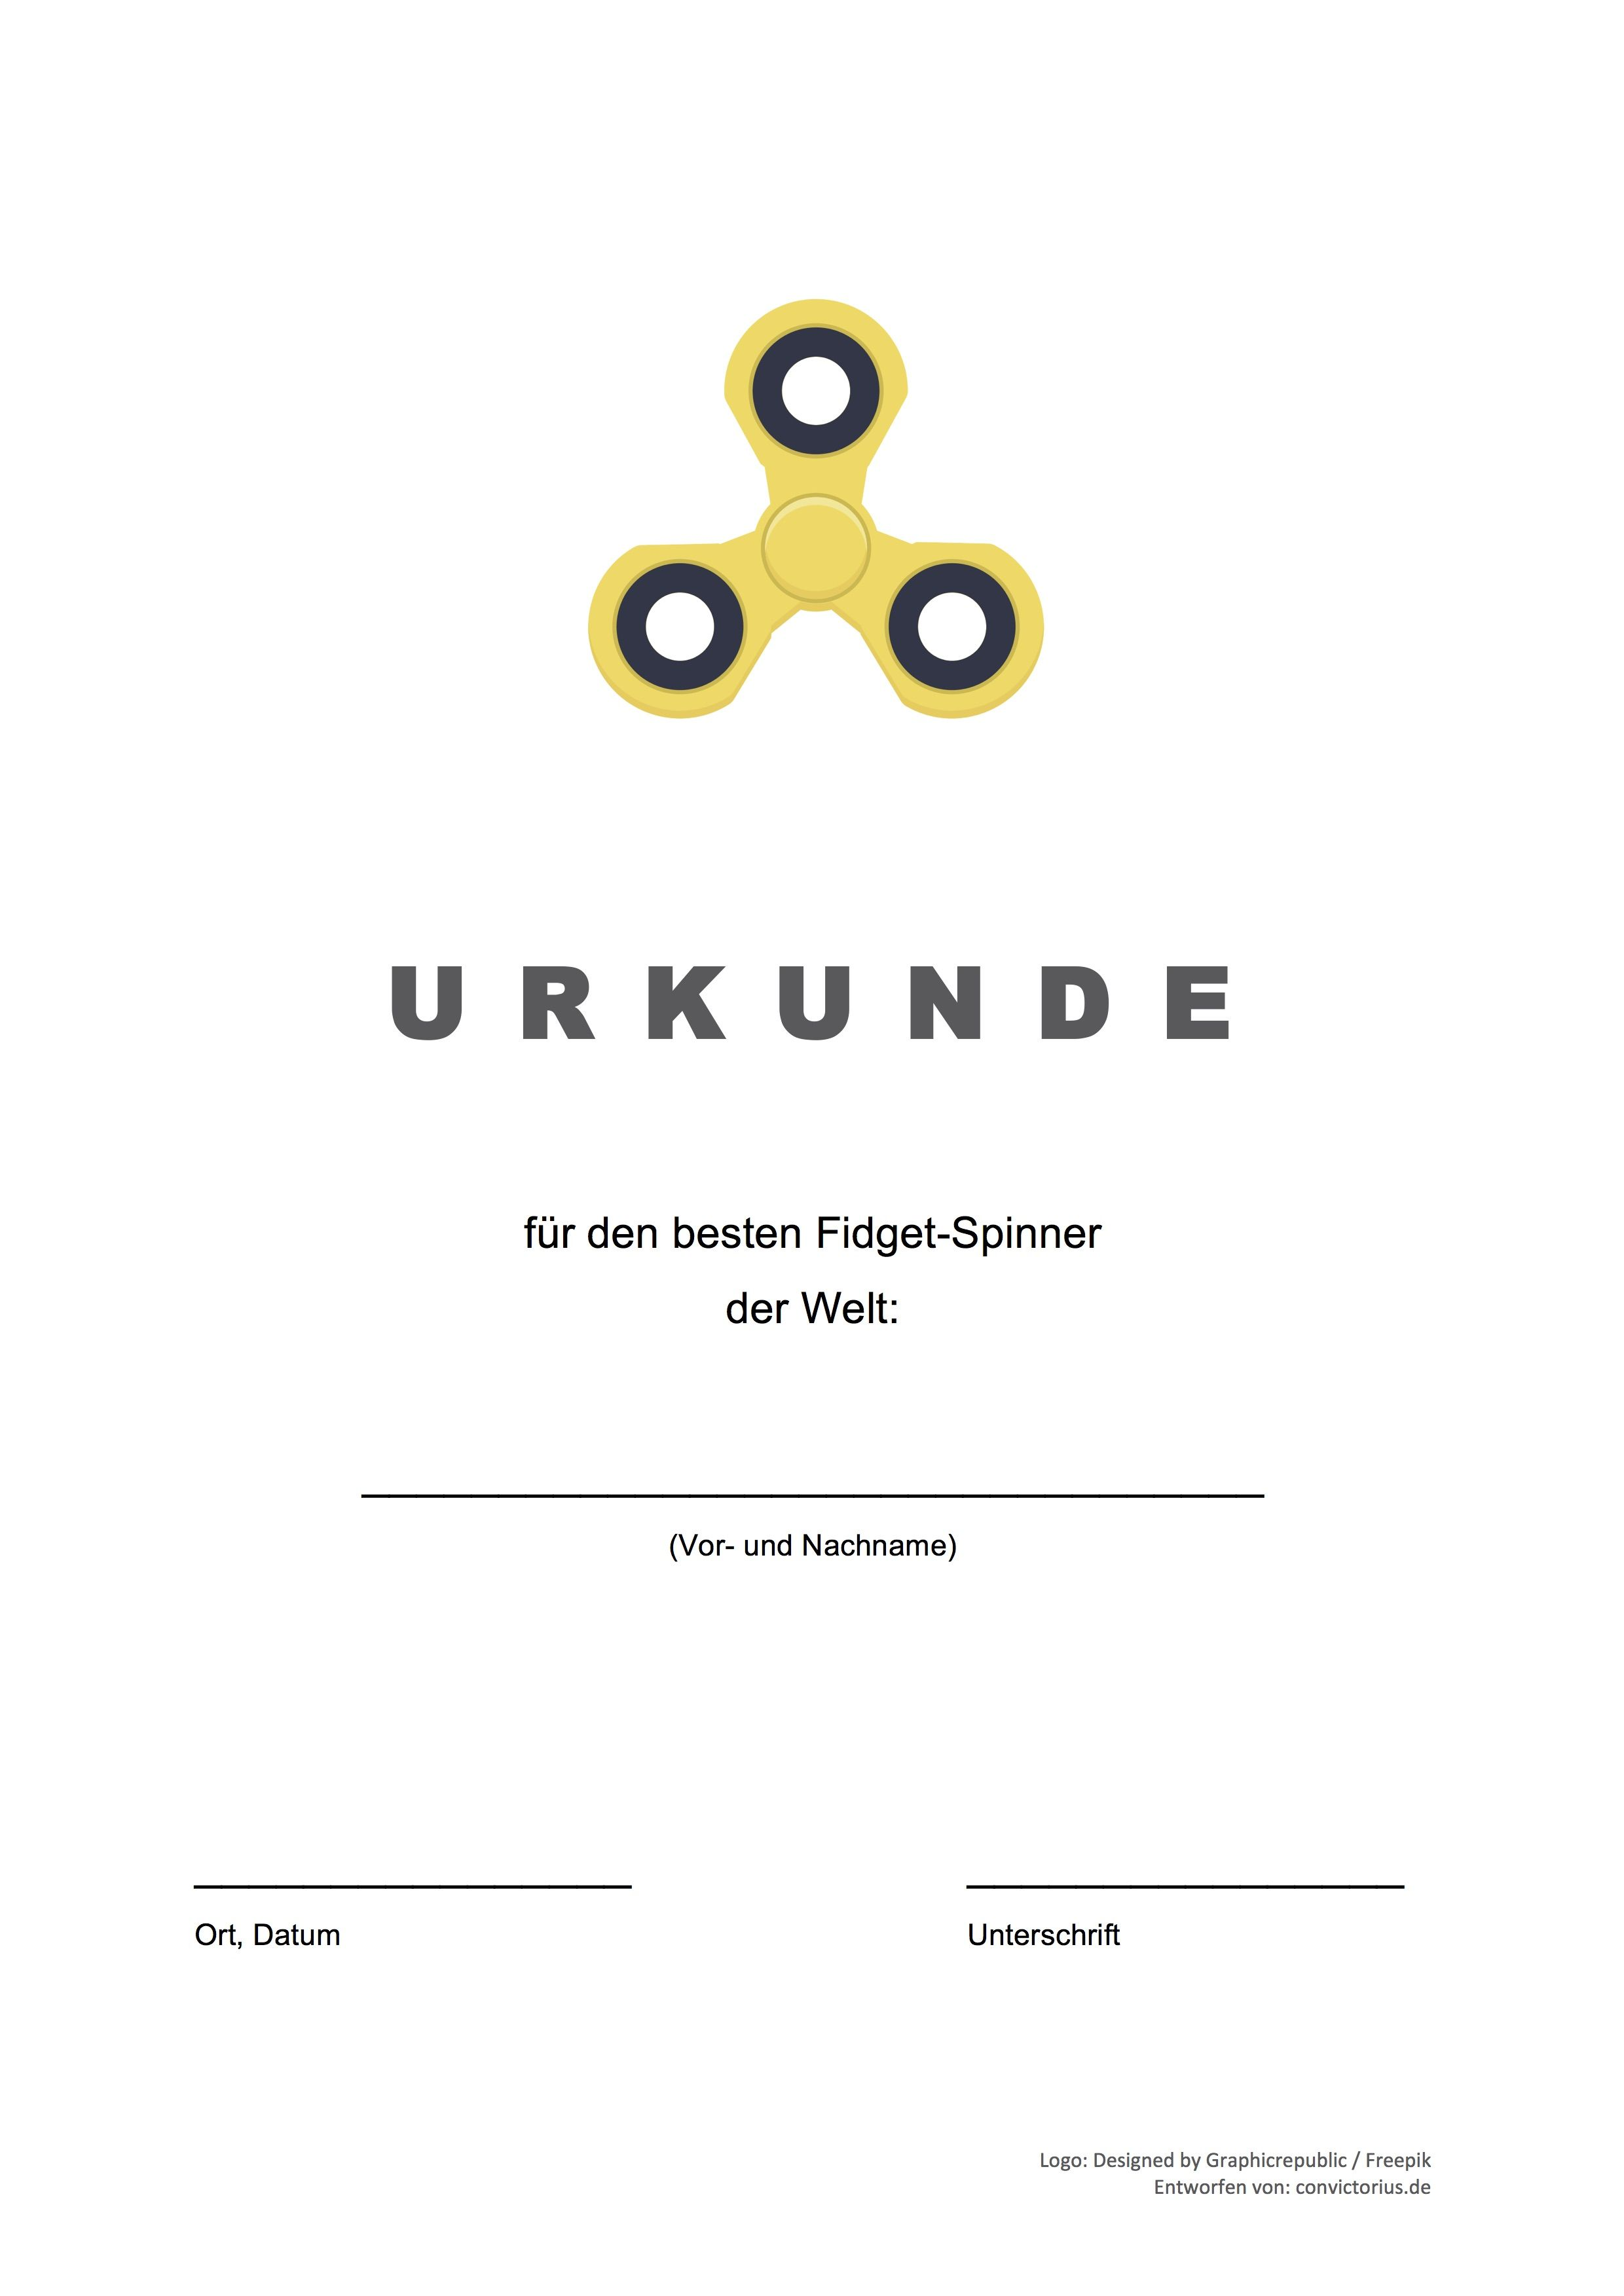 Gratis-Vorlage: Fidget Spinner Urkunde (word/pdf) | Vorlagen ...